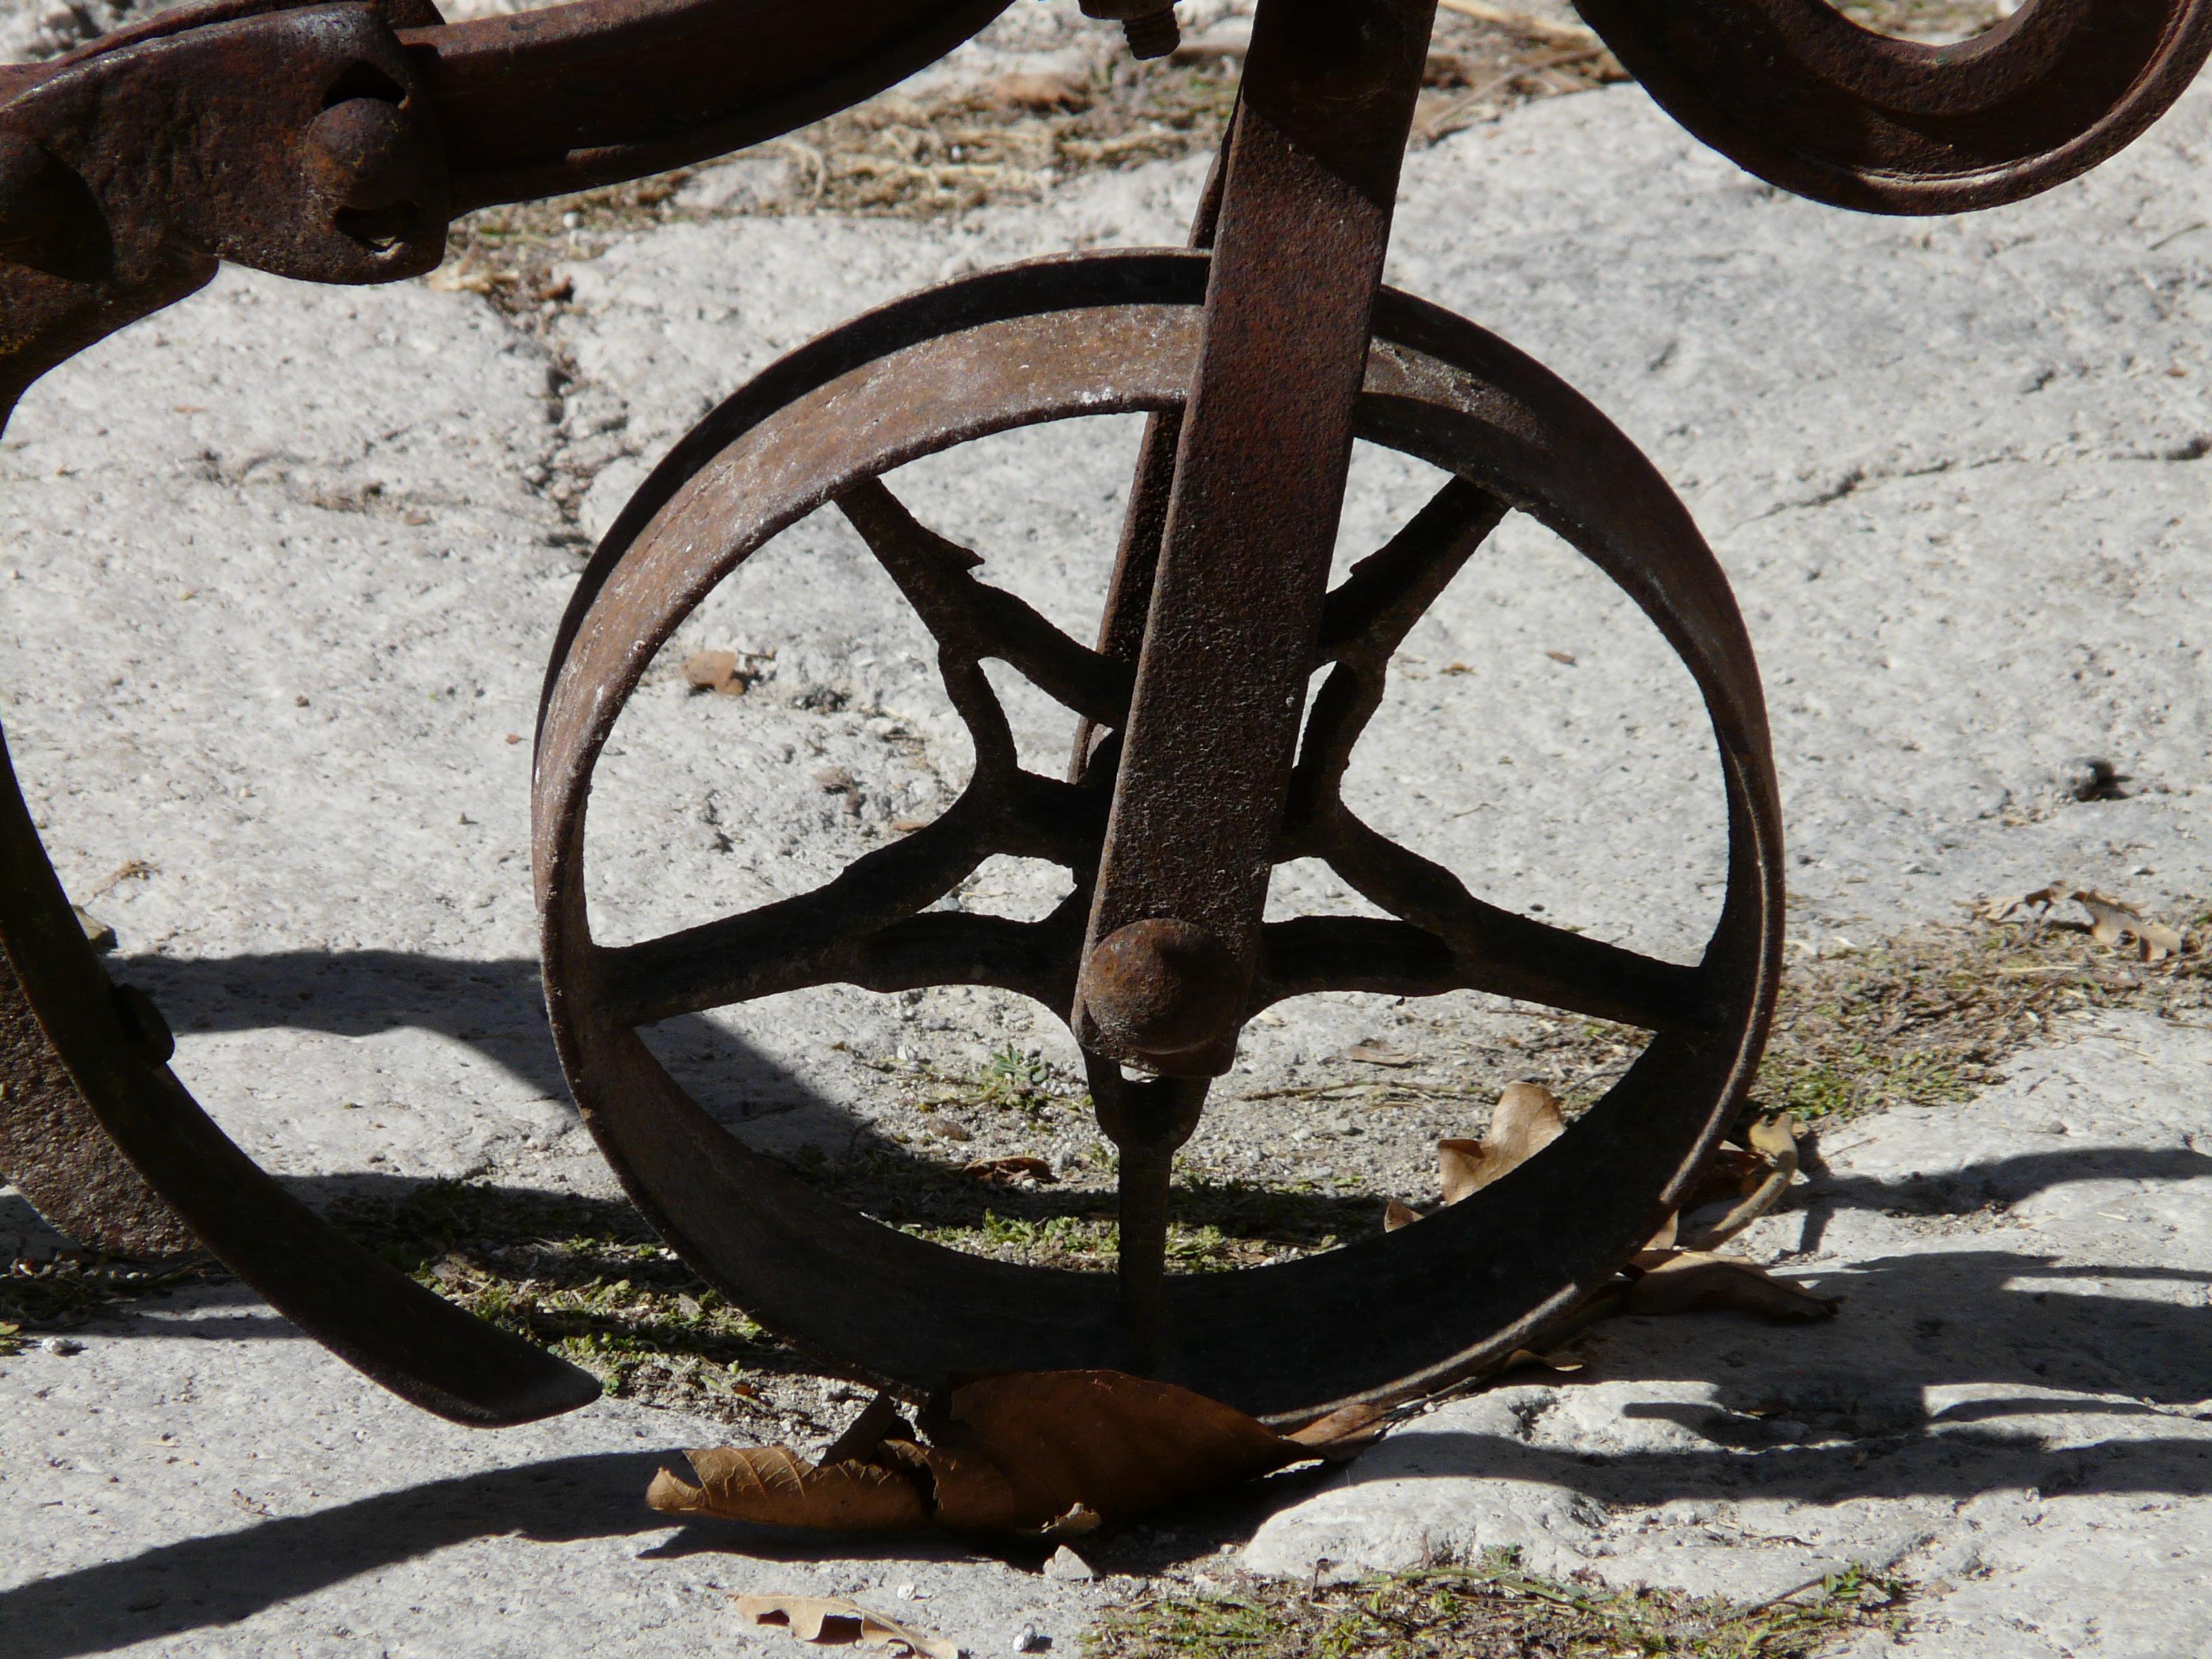 Kostenlose foto  Holz Rad Fahrrad Fahrzeug Metall Material